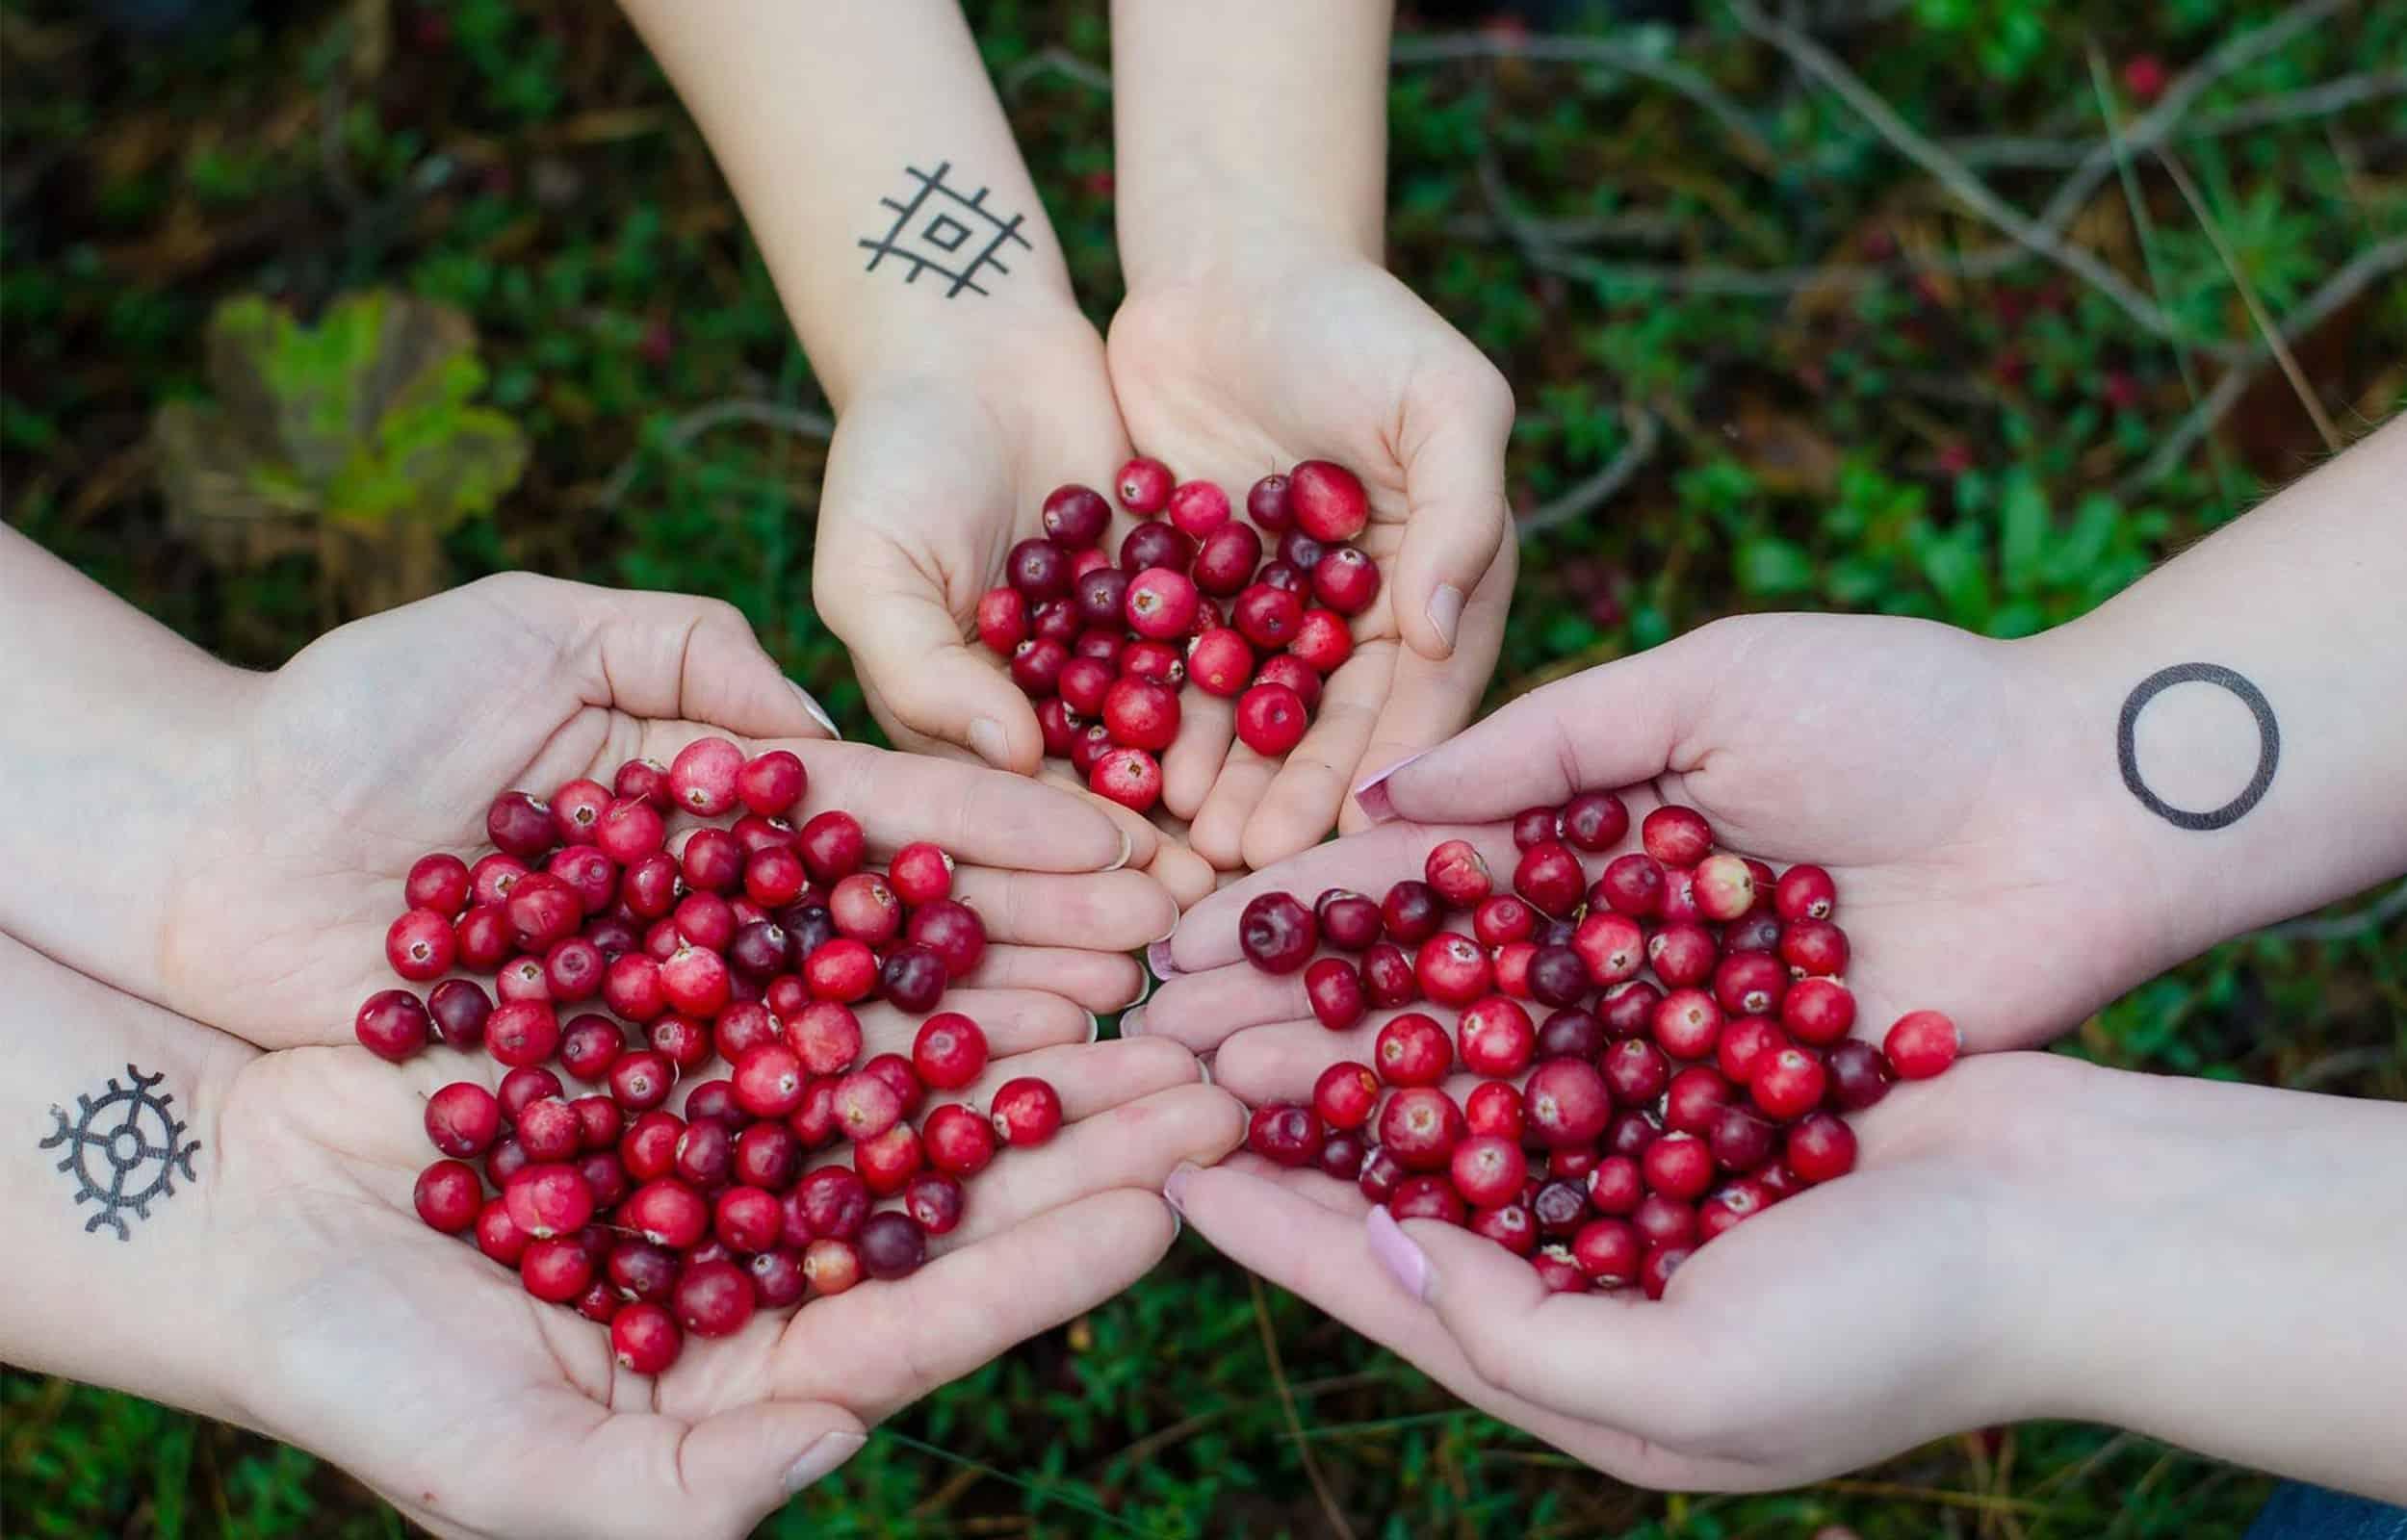 palms holding cranberries